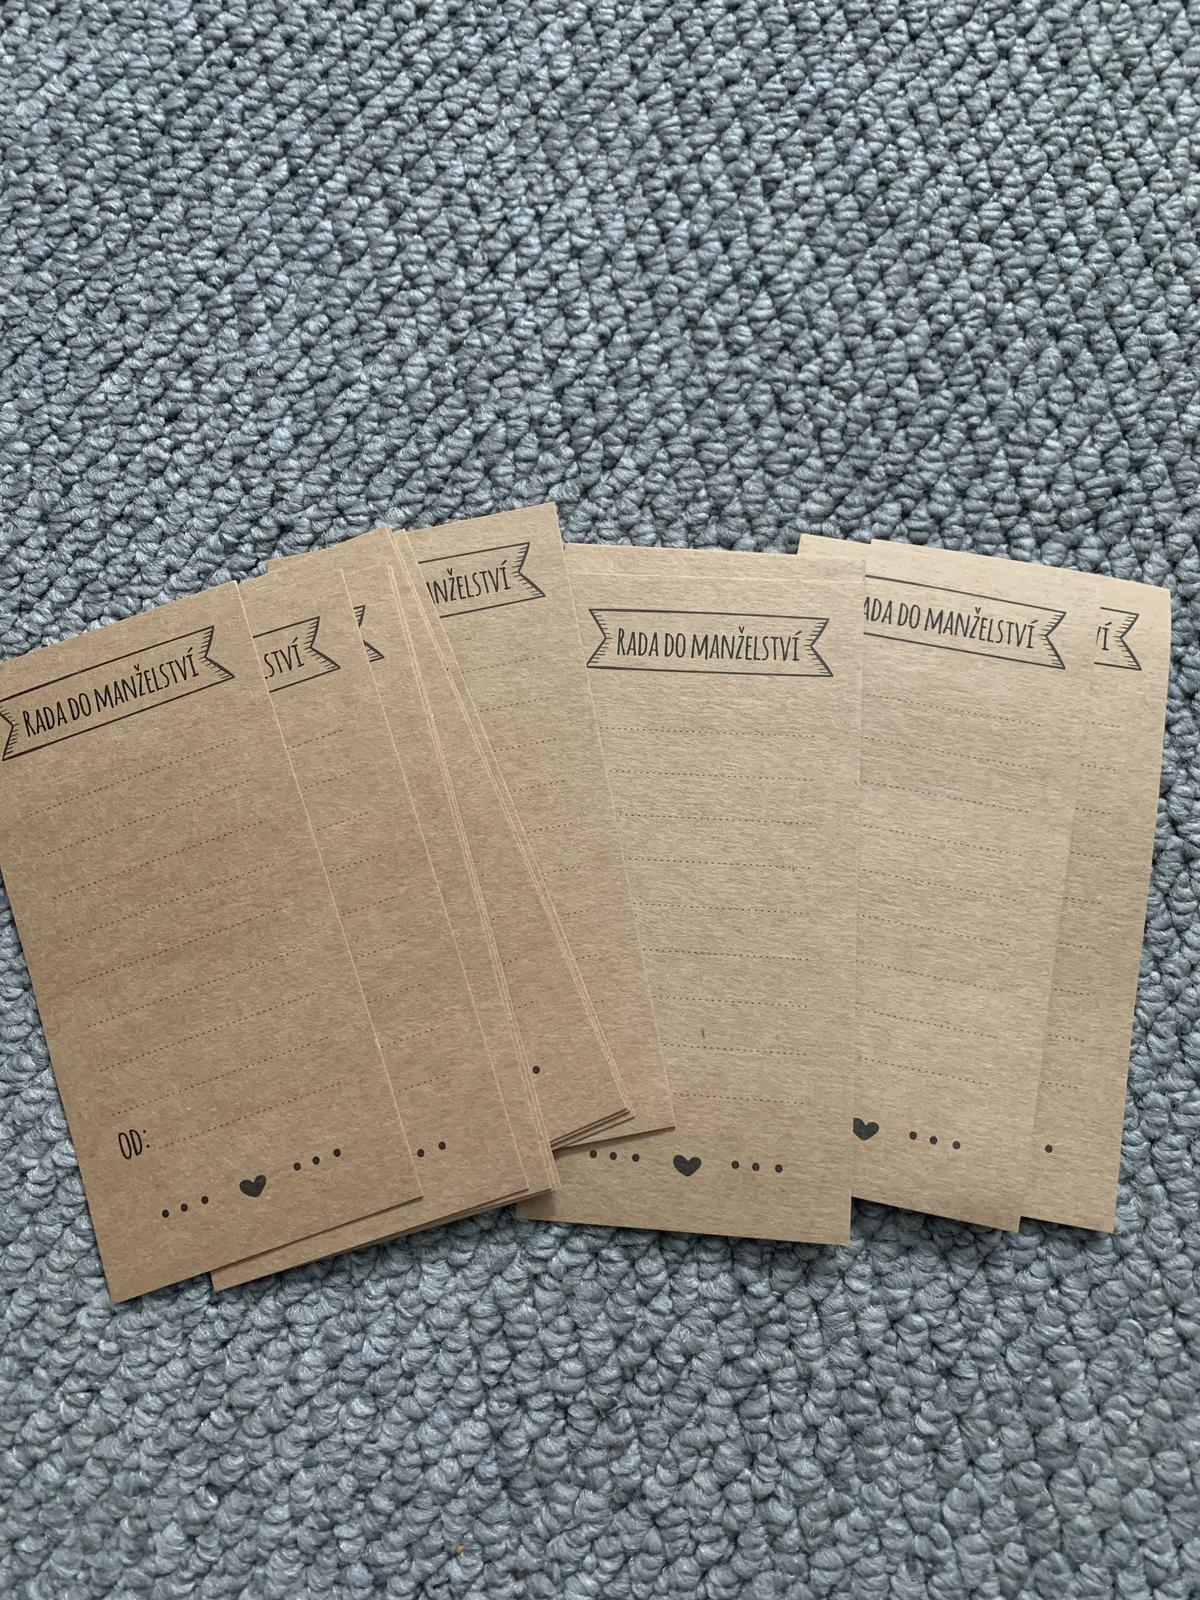 Rady manželům - kraftové kartičky - Obrázek č. 2